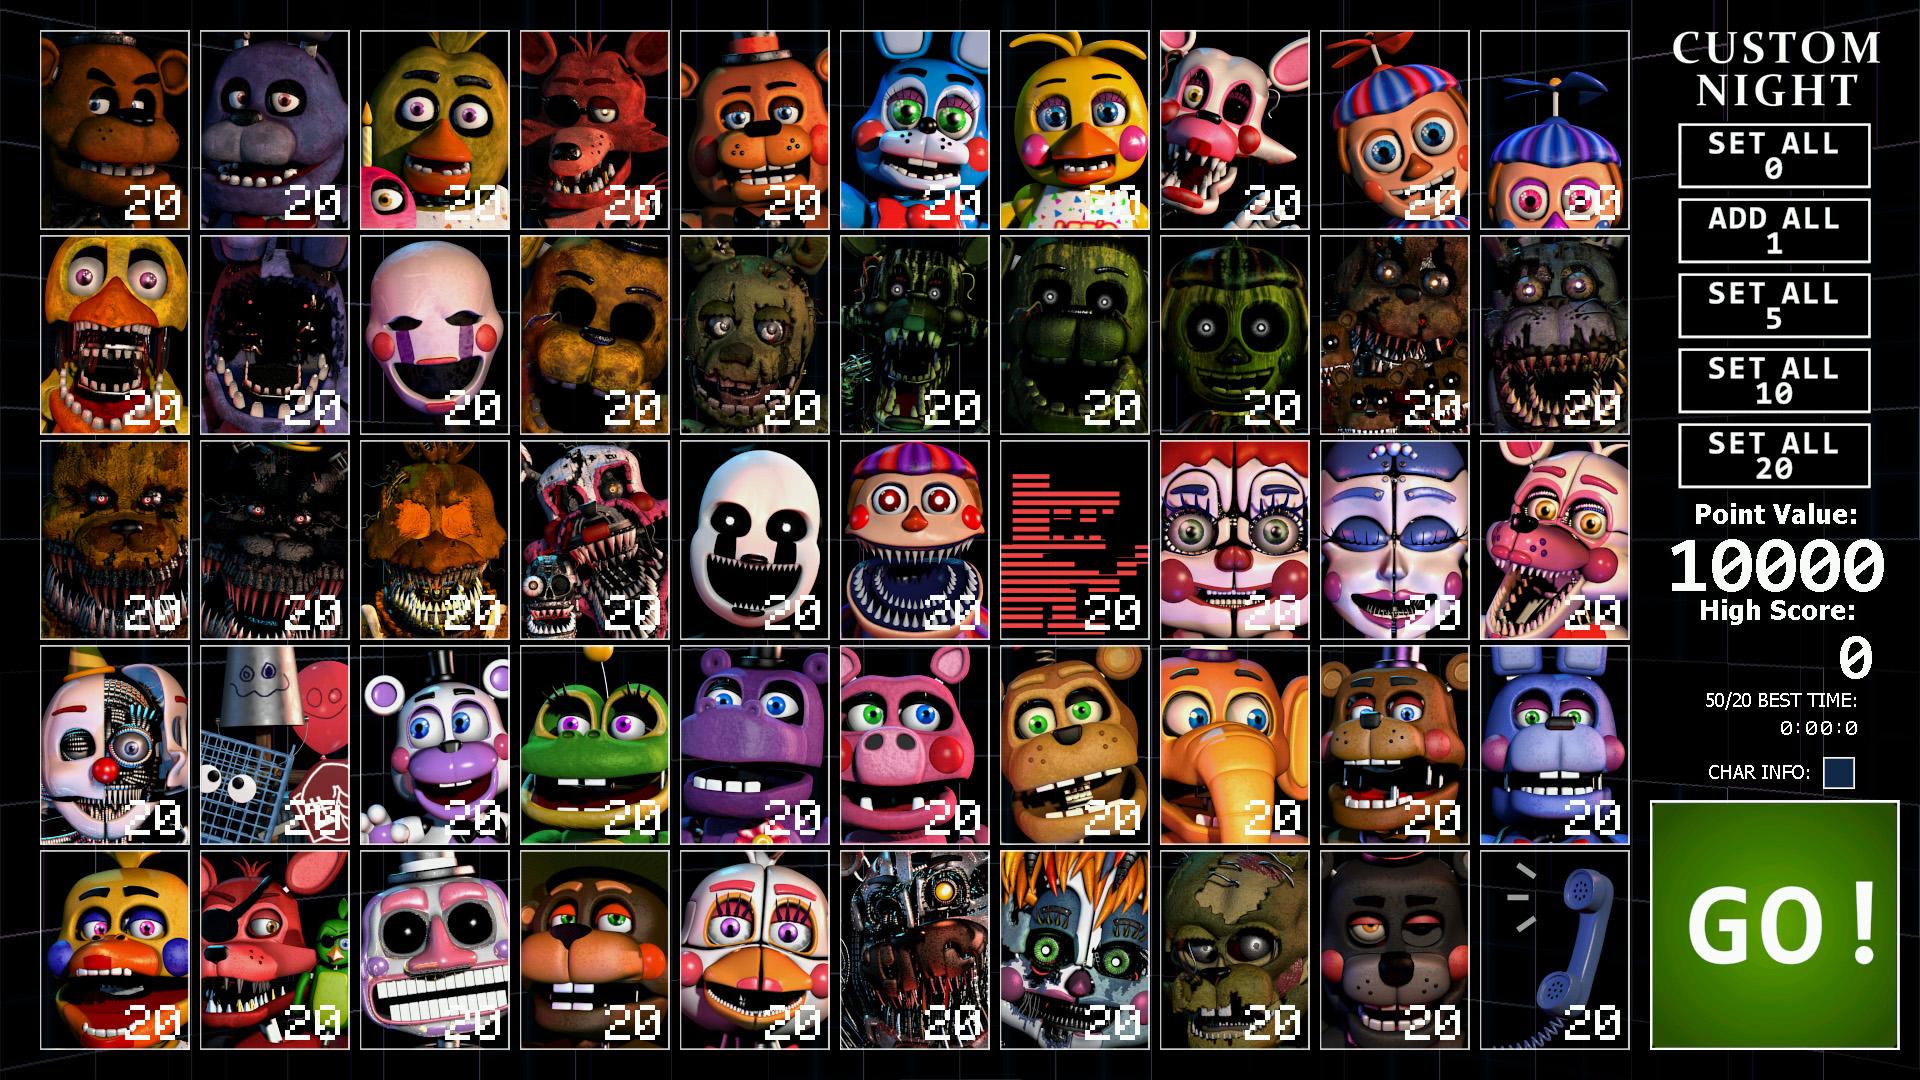 Image Ultimate Custom Night Teaser 7 Jpg Freddy